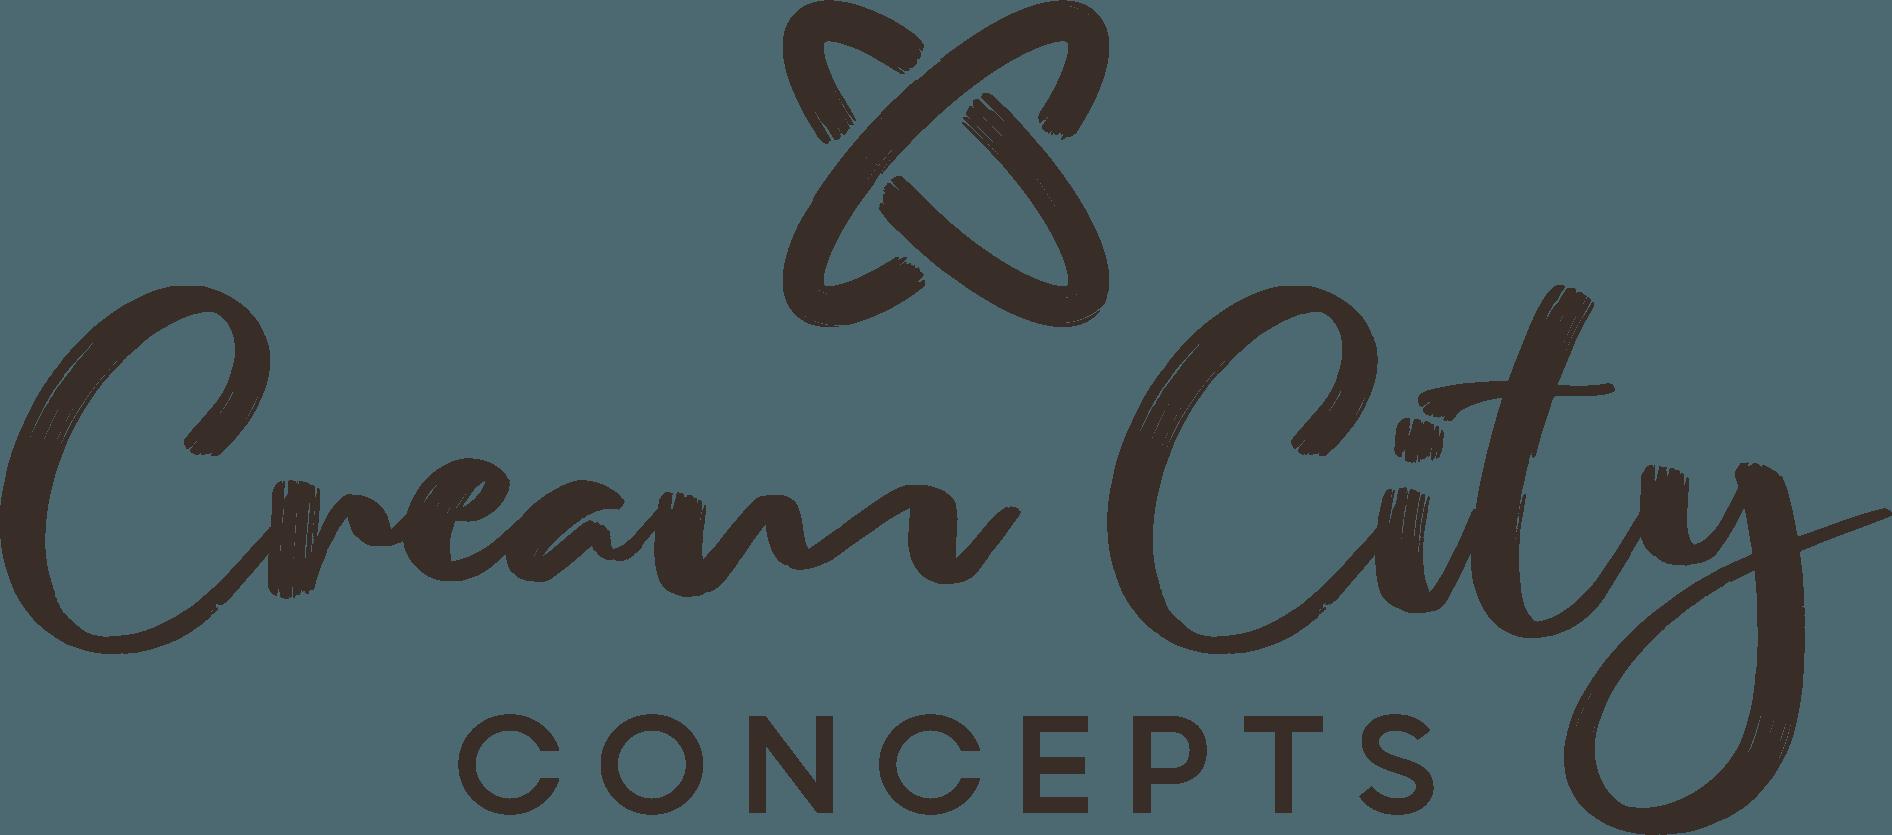 Cream City Concepts